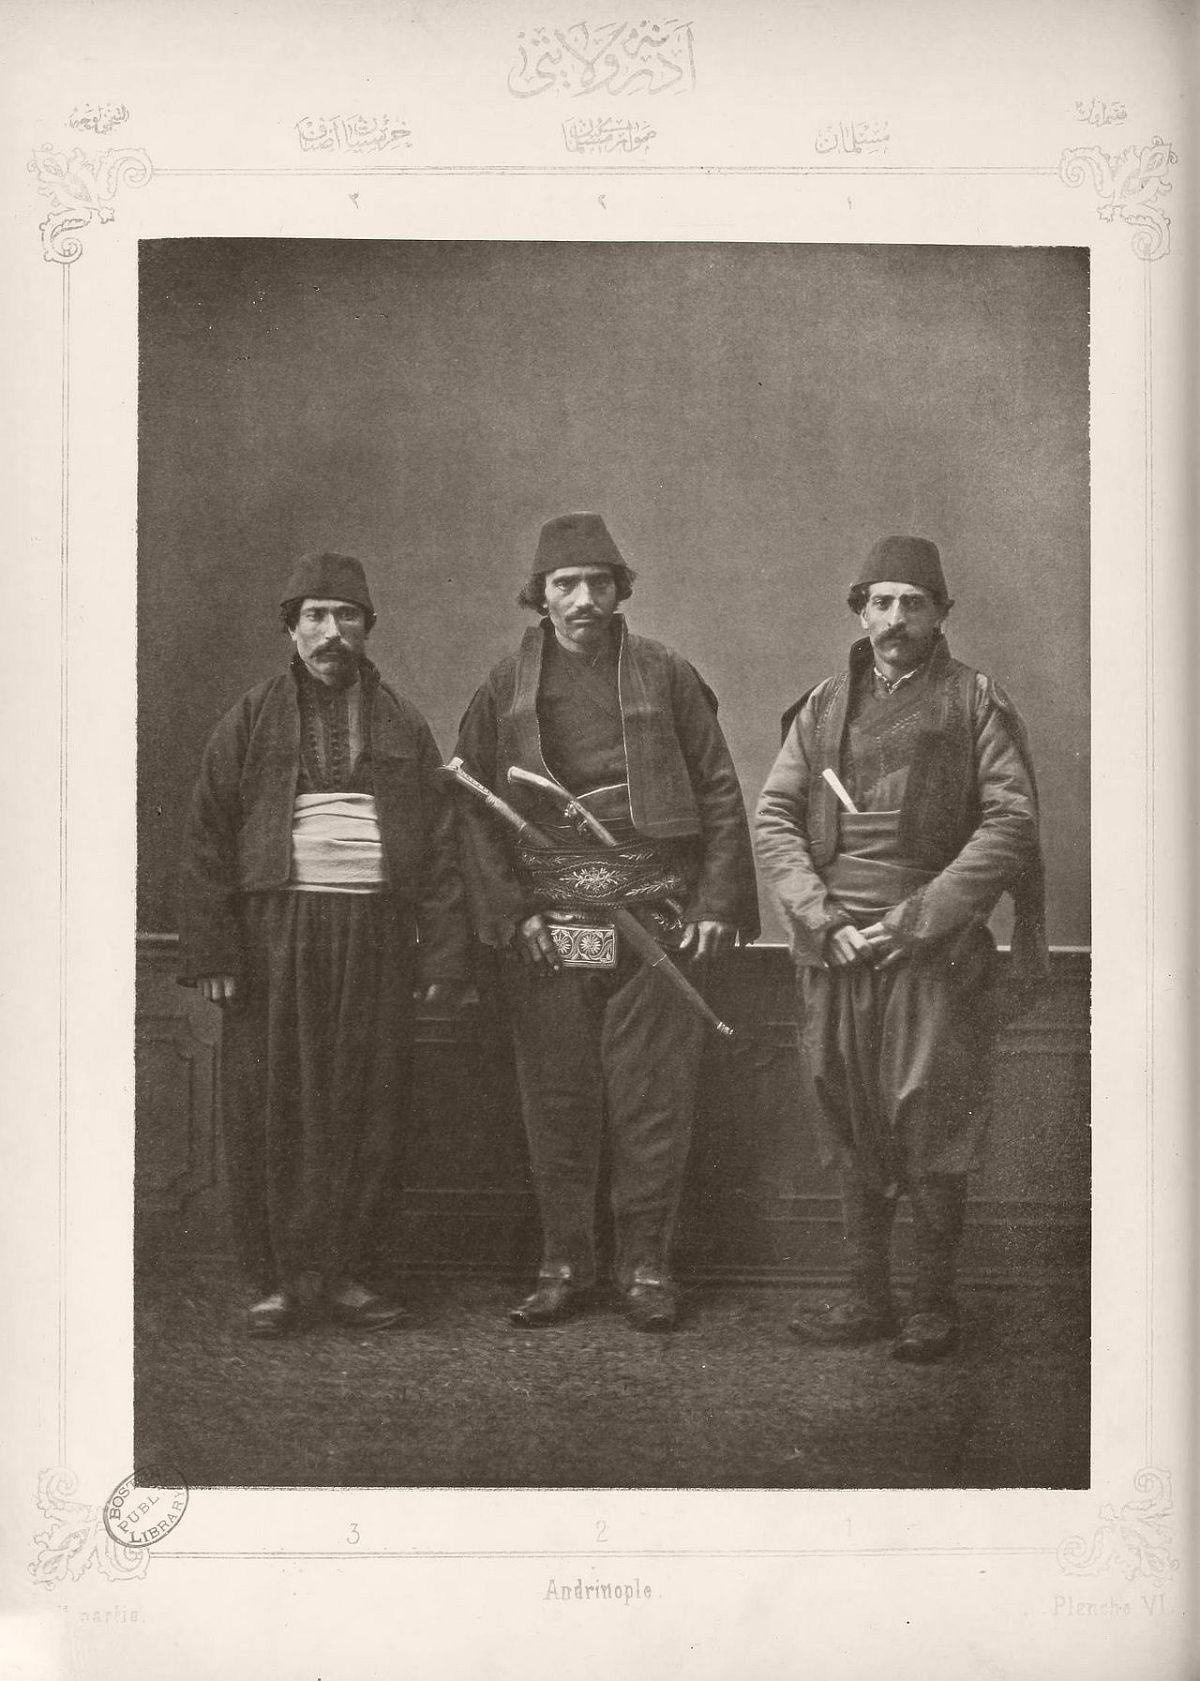 1. Muslim inhabitant of Edirne 2. Muslim horseman from Edirne 3. Christian artisan from Edirne